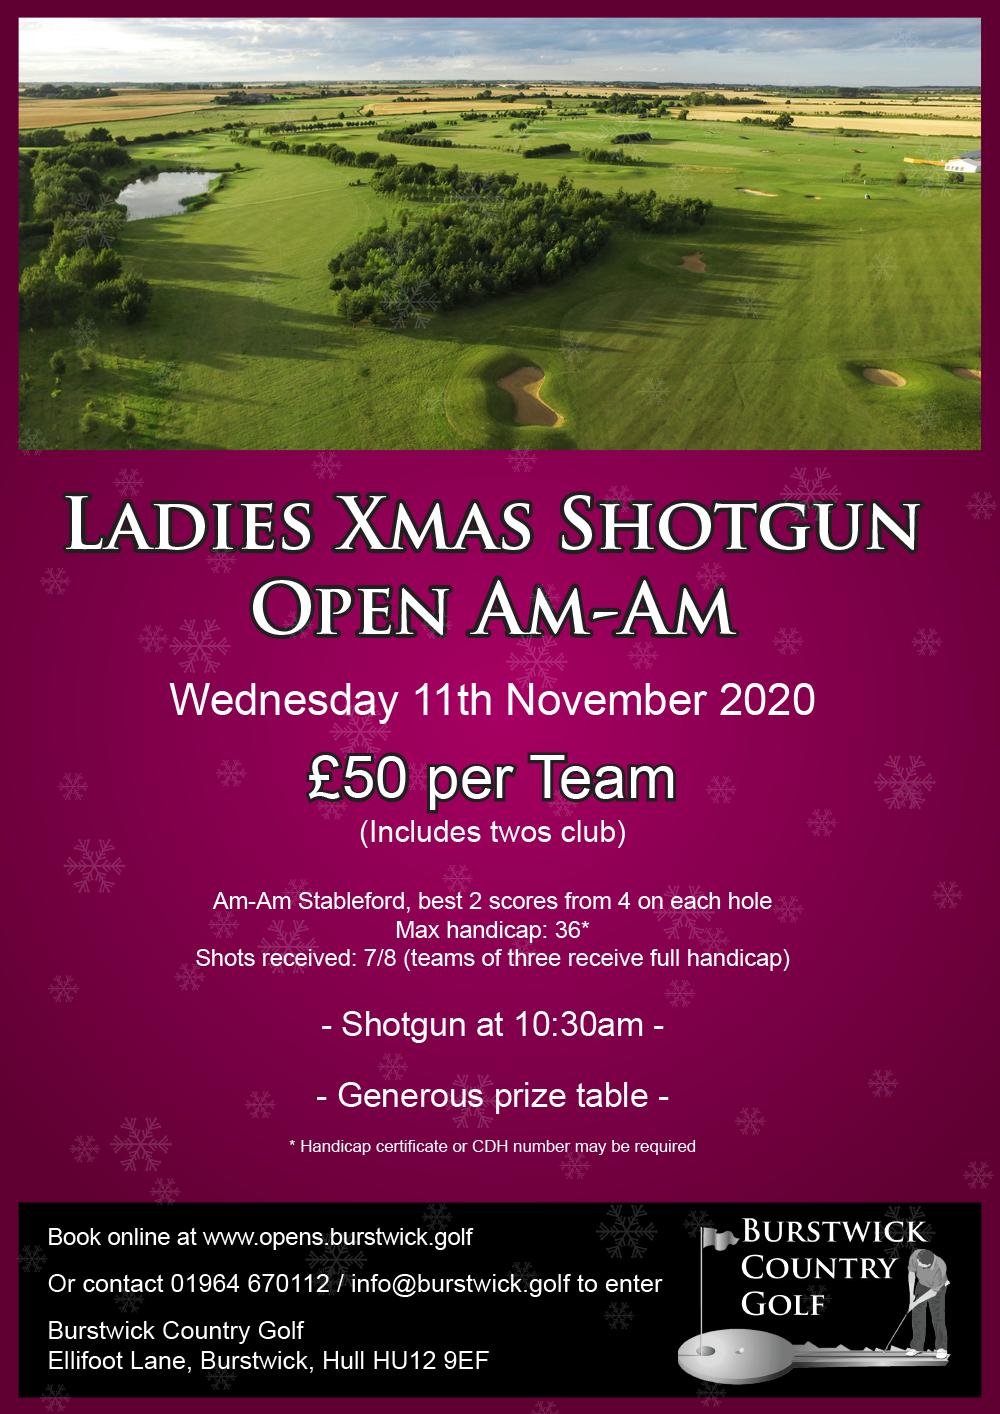 Ladies Xmas Shotgun Open Am-Am